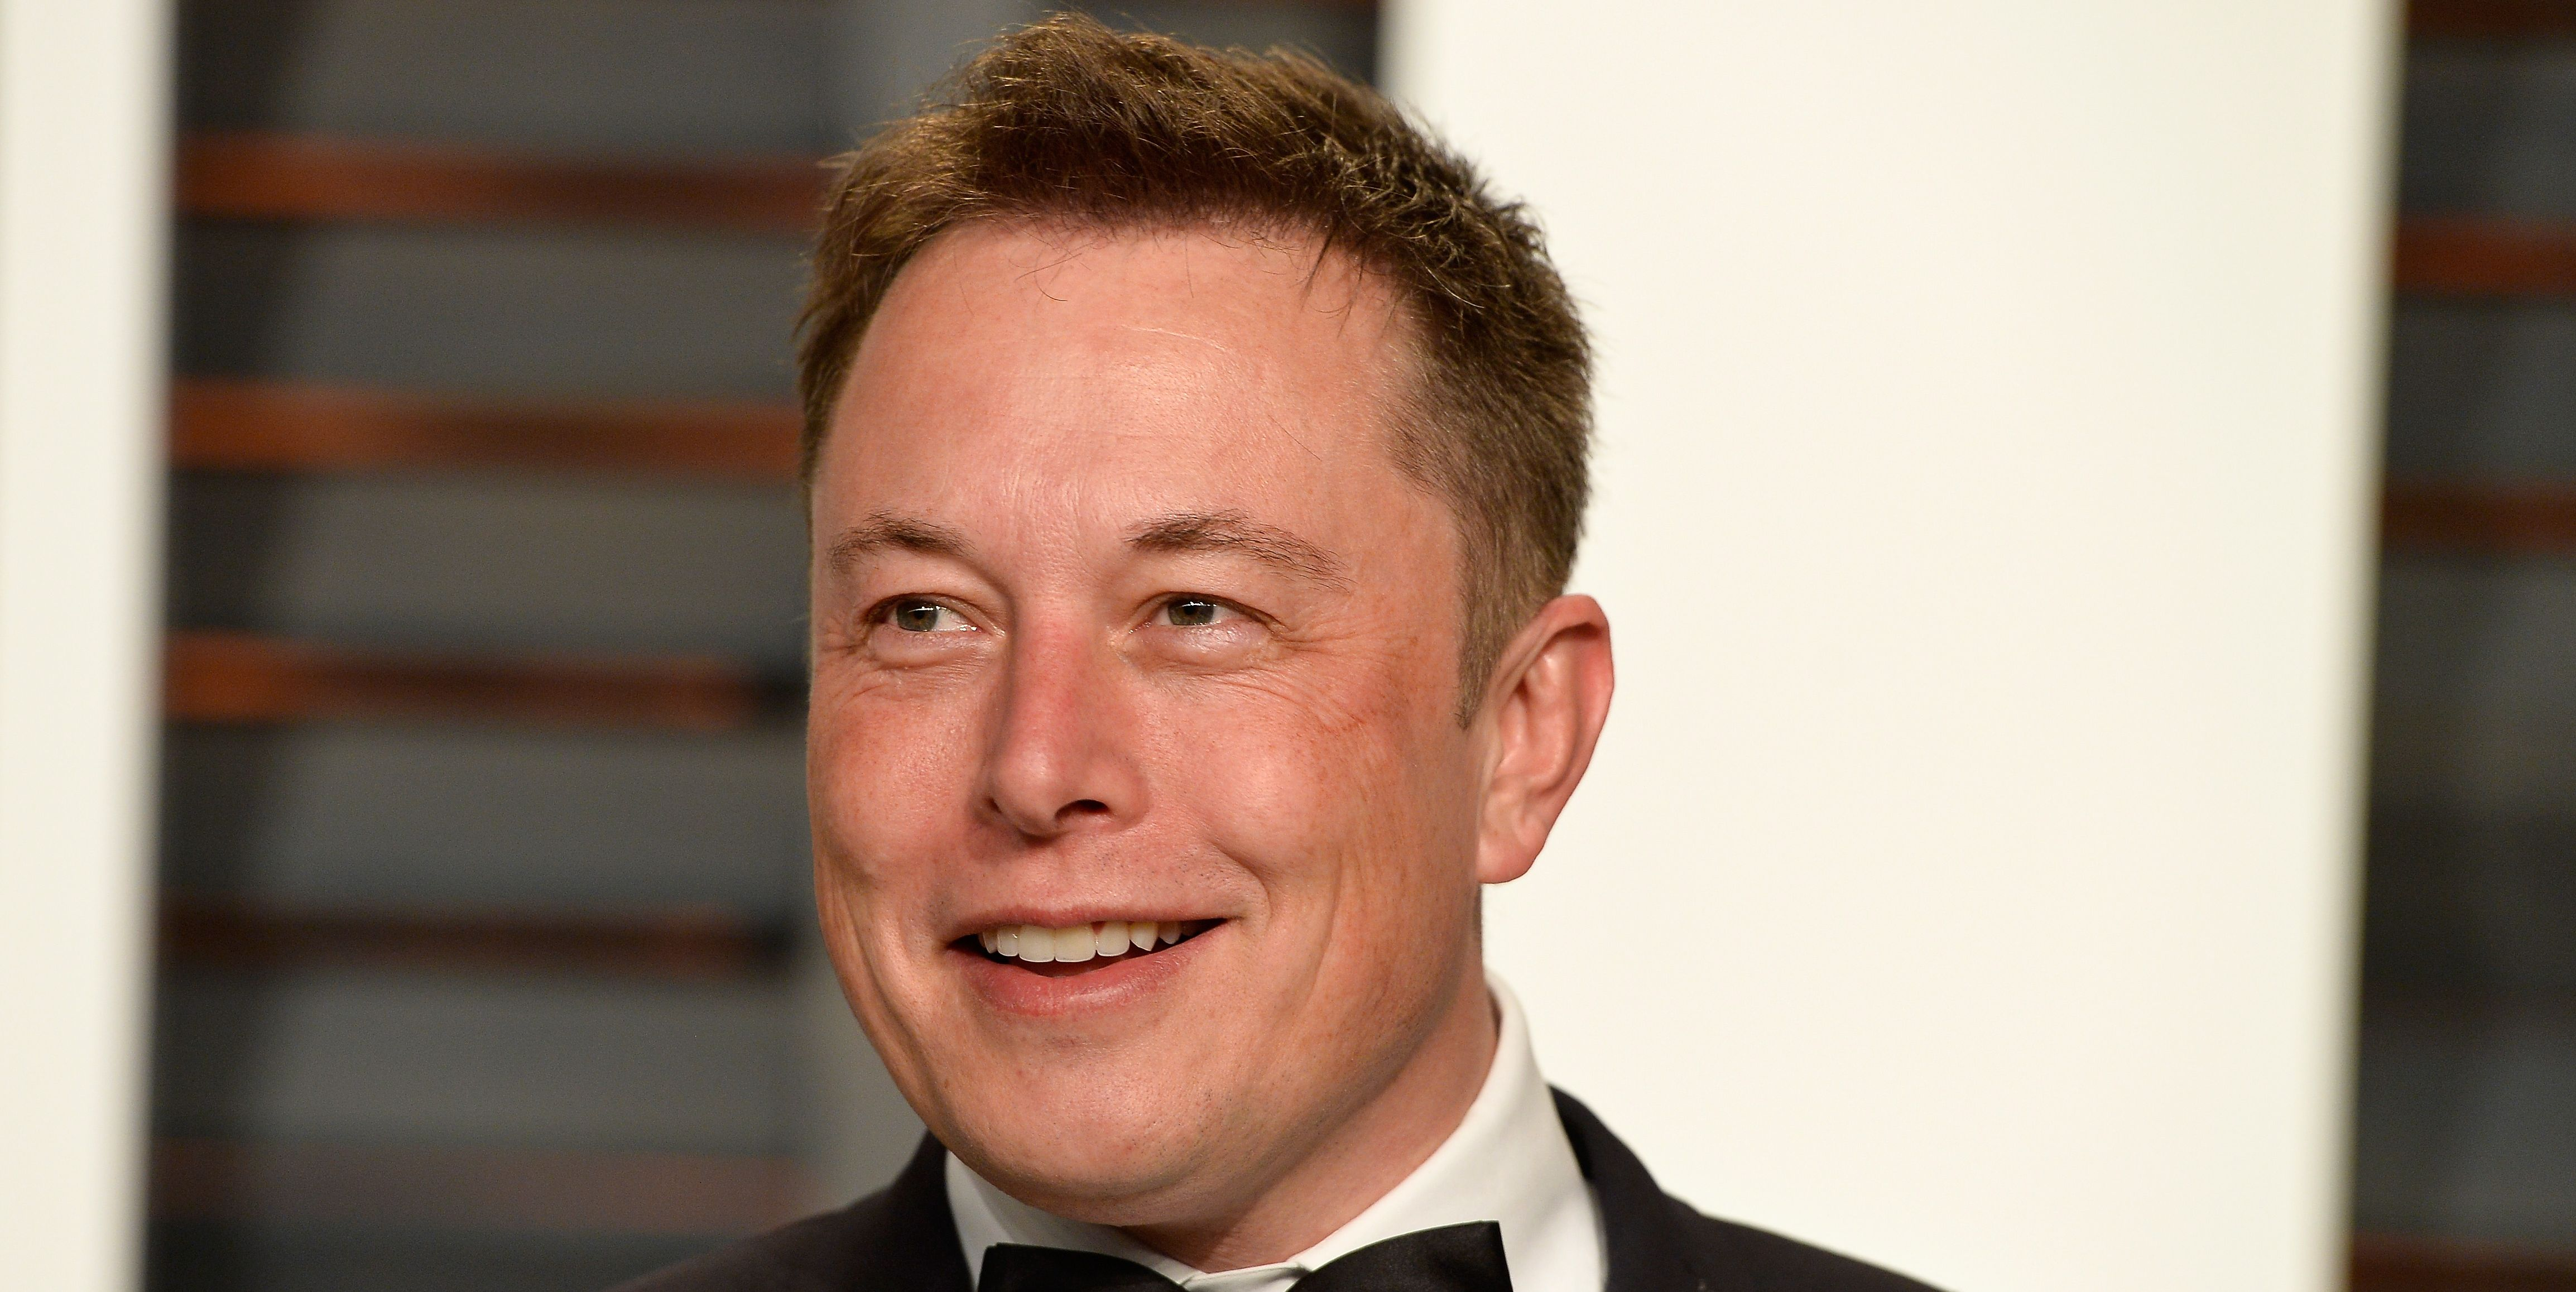 Elon Musk Net Worth 2017 How Much Is Tesla Ceo Elon Musk Worth